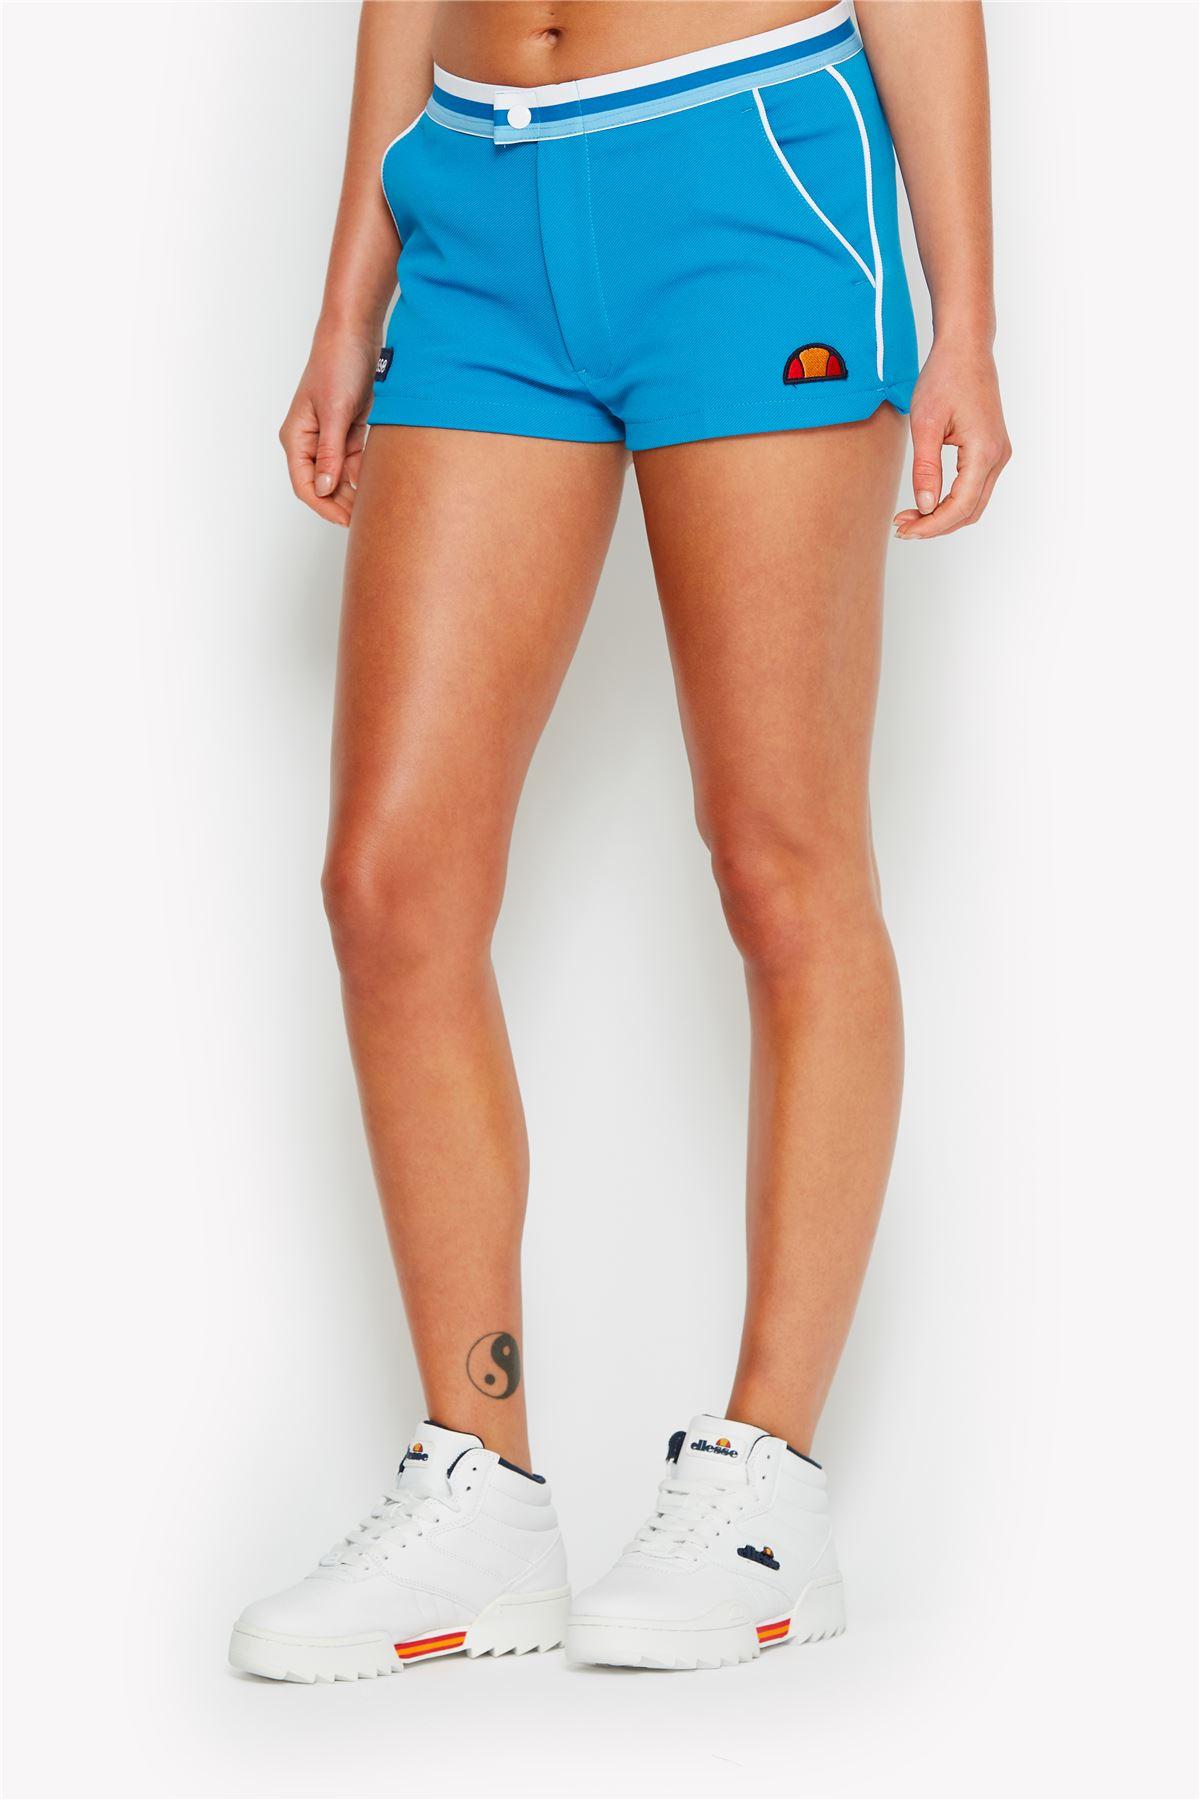 Women Ellesse Jet Retro Shorts Blue x 4 pairs